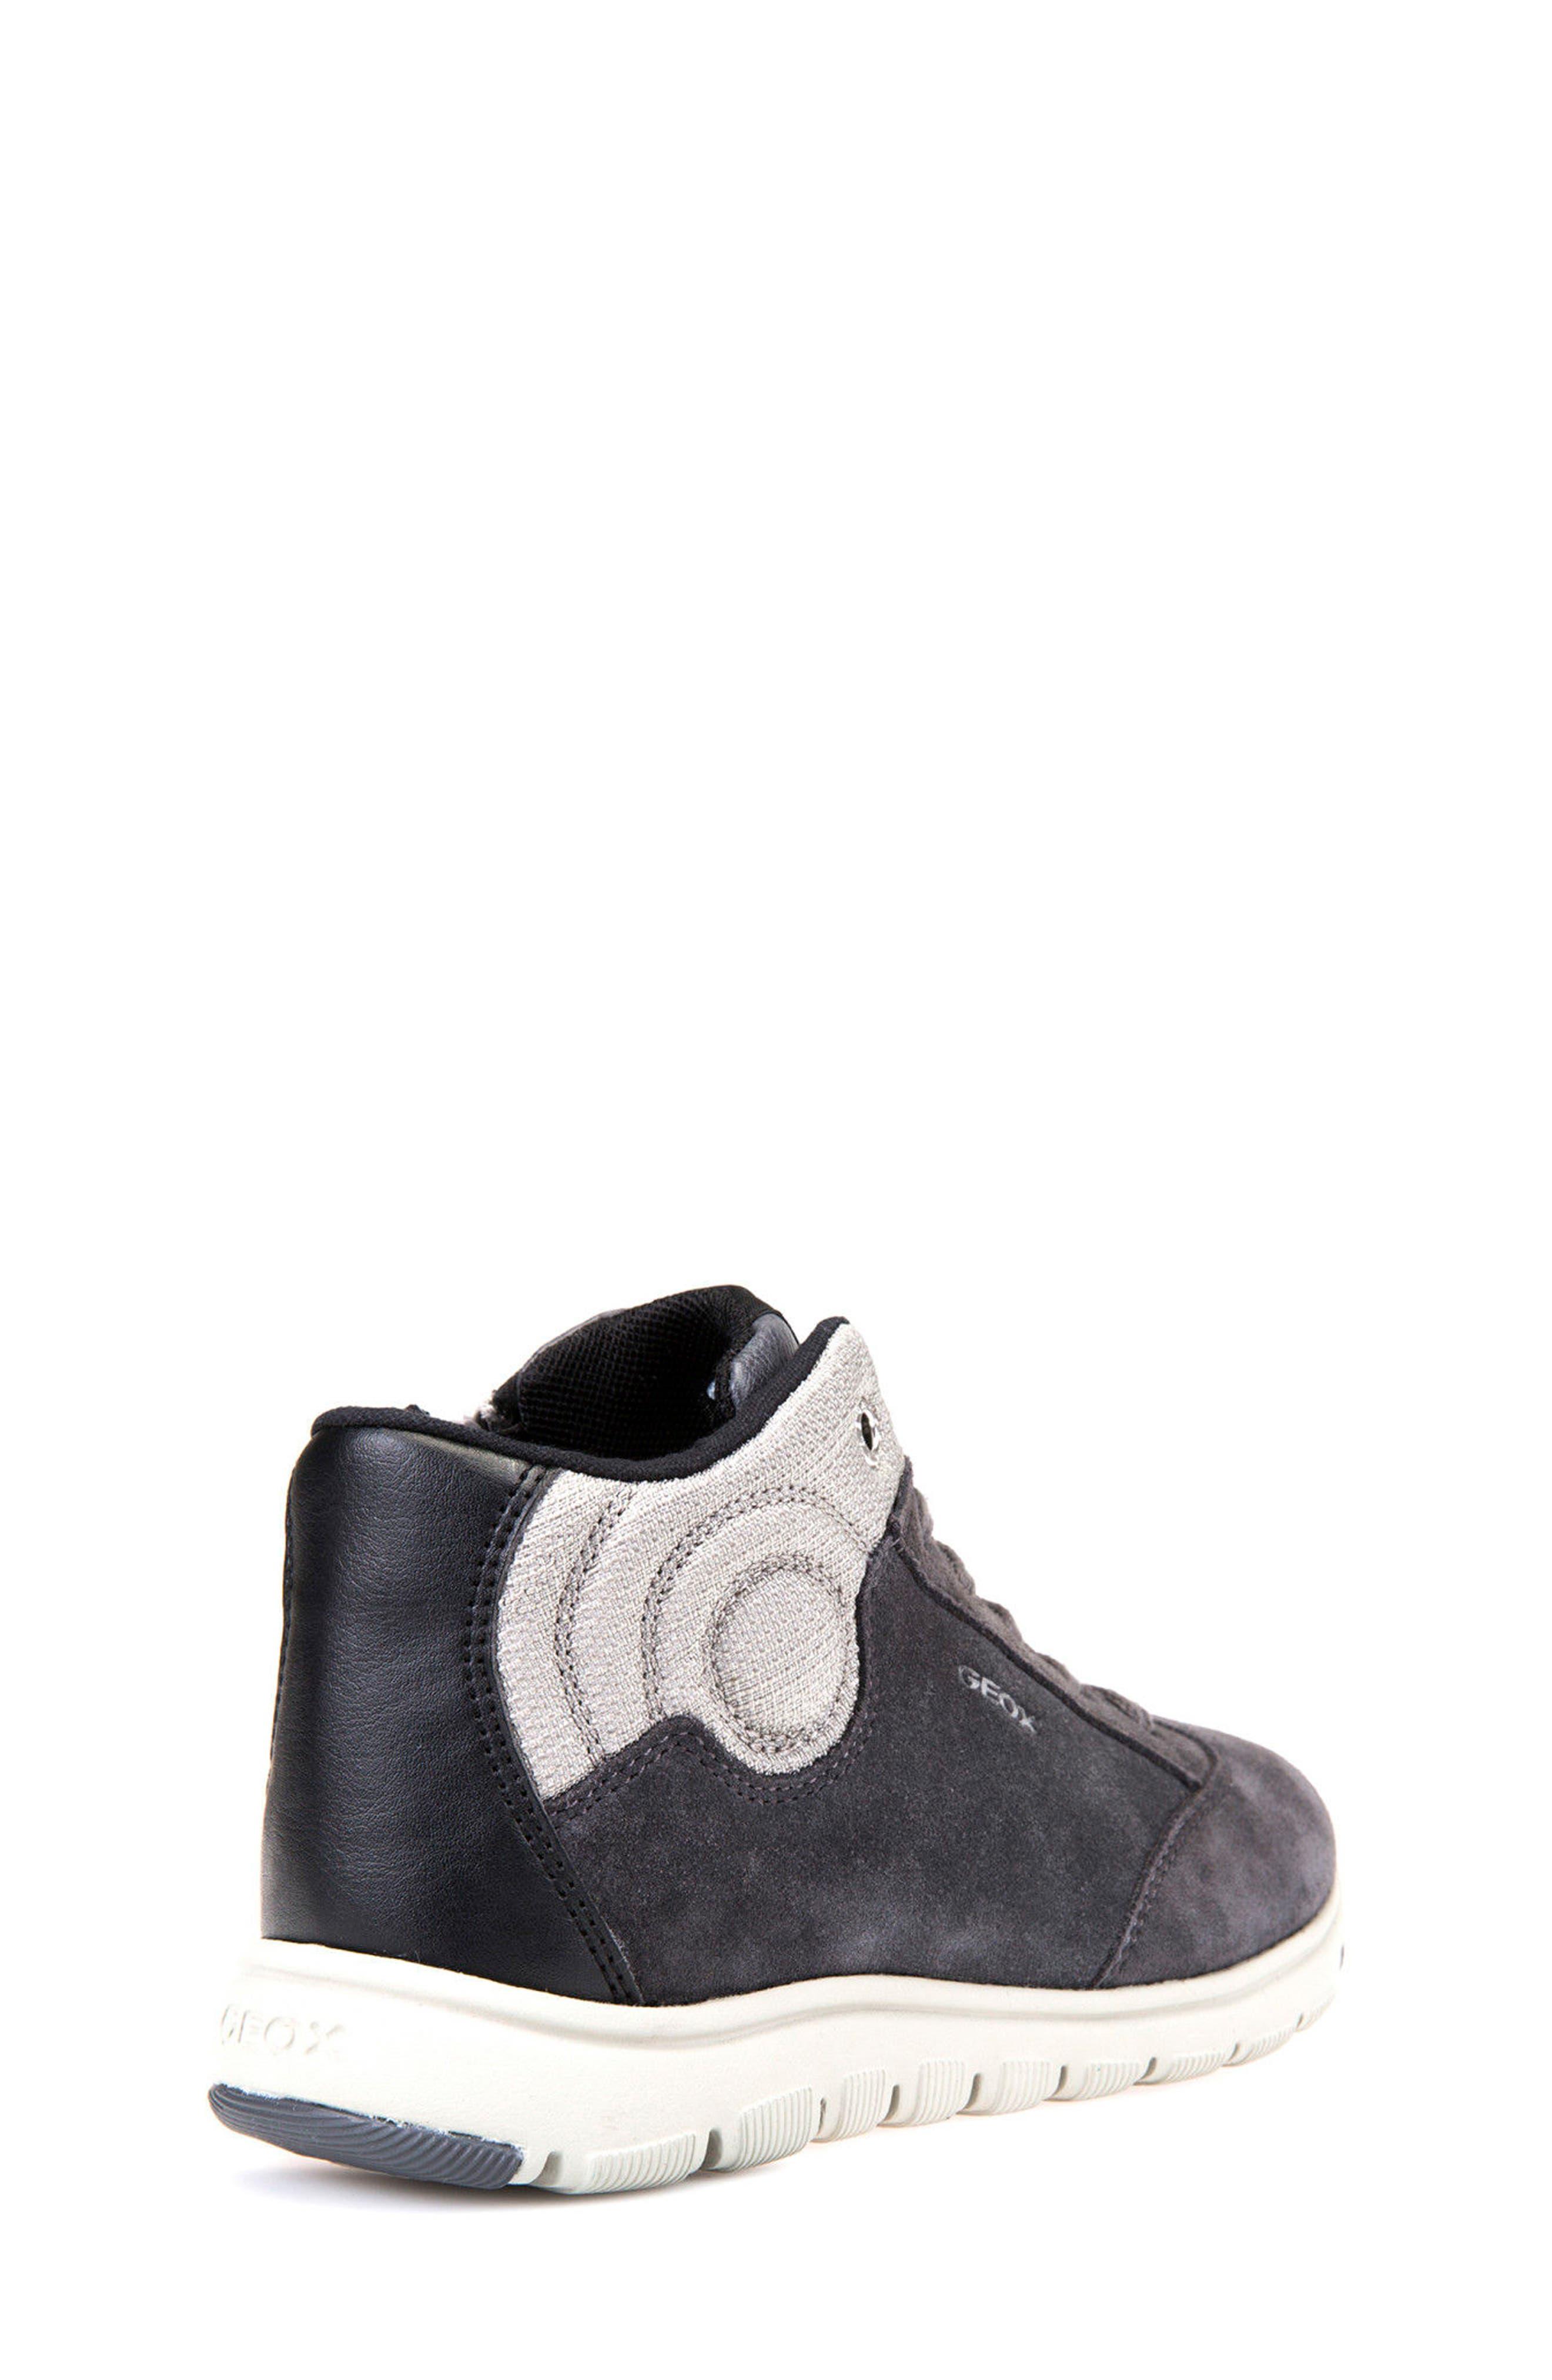 Xunday Mid Top Sneaker,                             Alternate thumbnail 7, color,                             Grey/ Light Grey